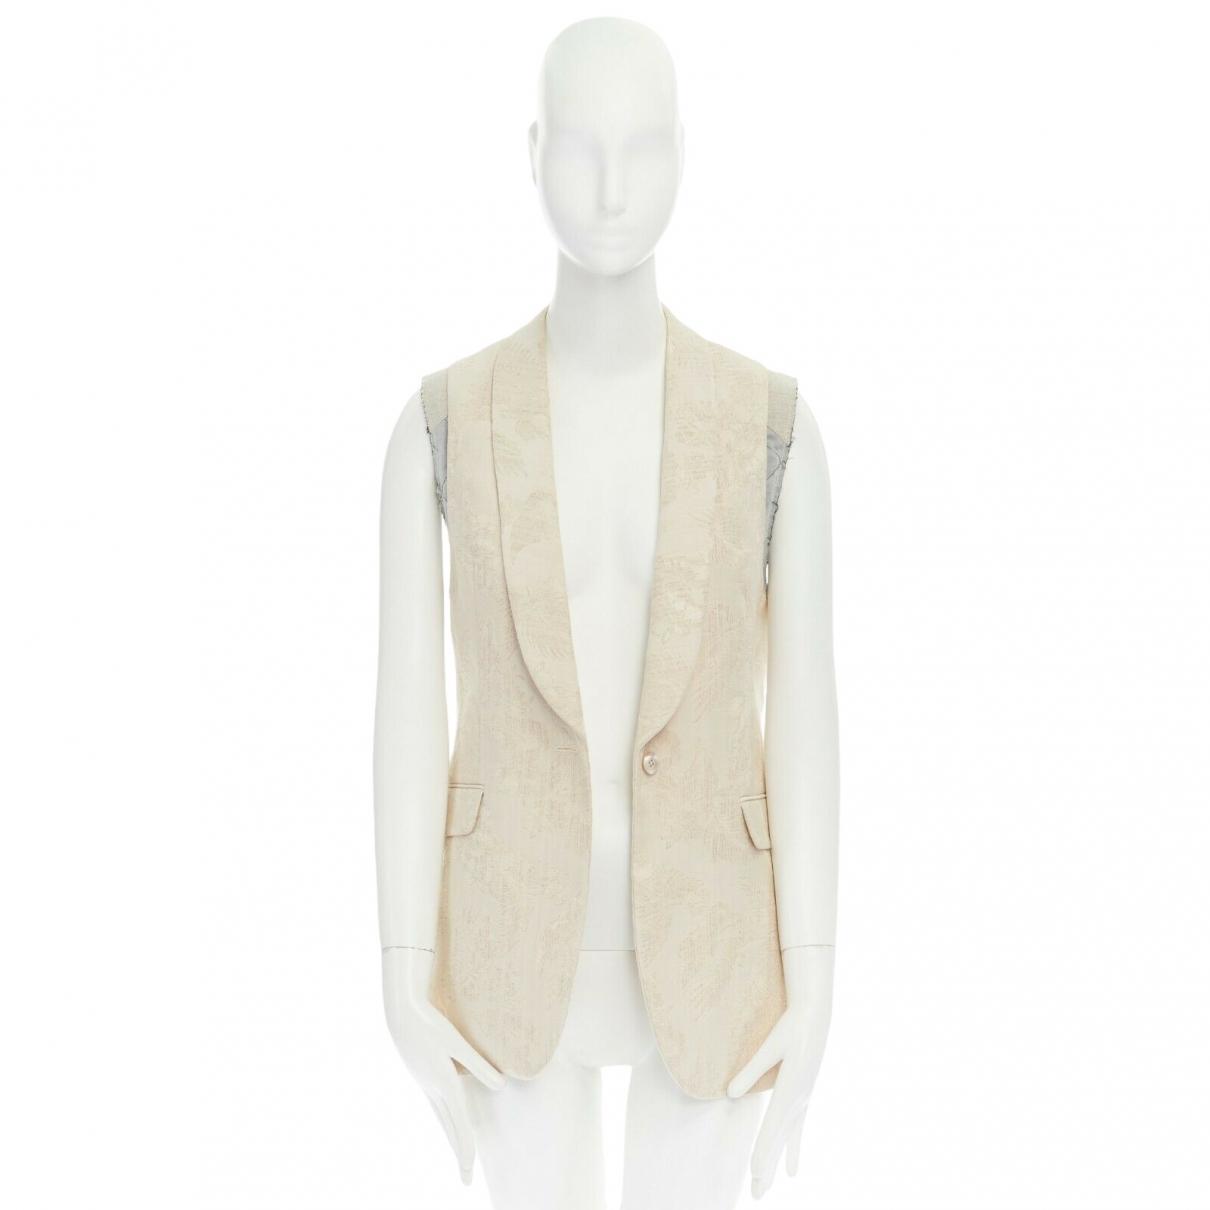 Dries Van Noten - Veste   pour femme en coton - beige